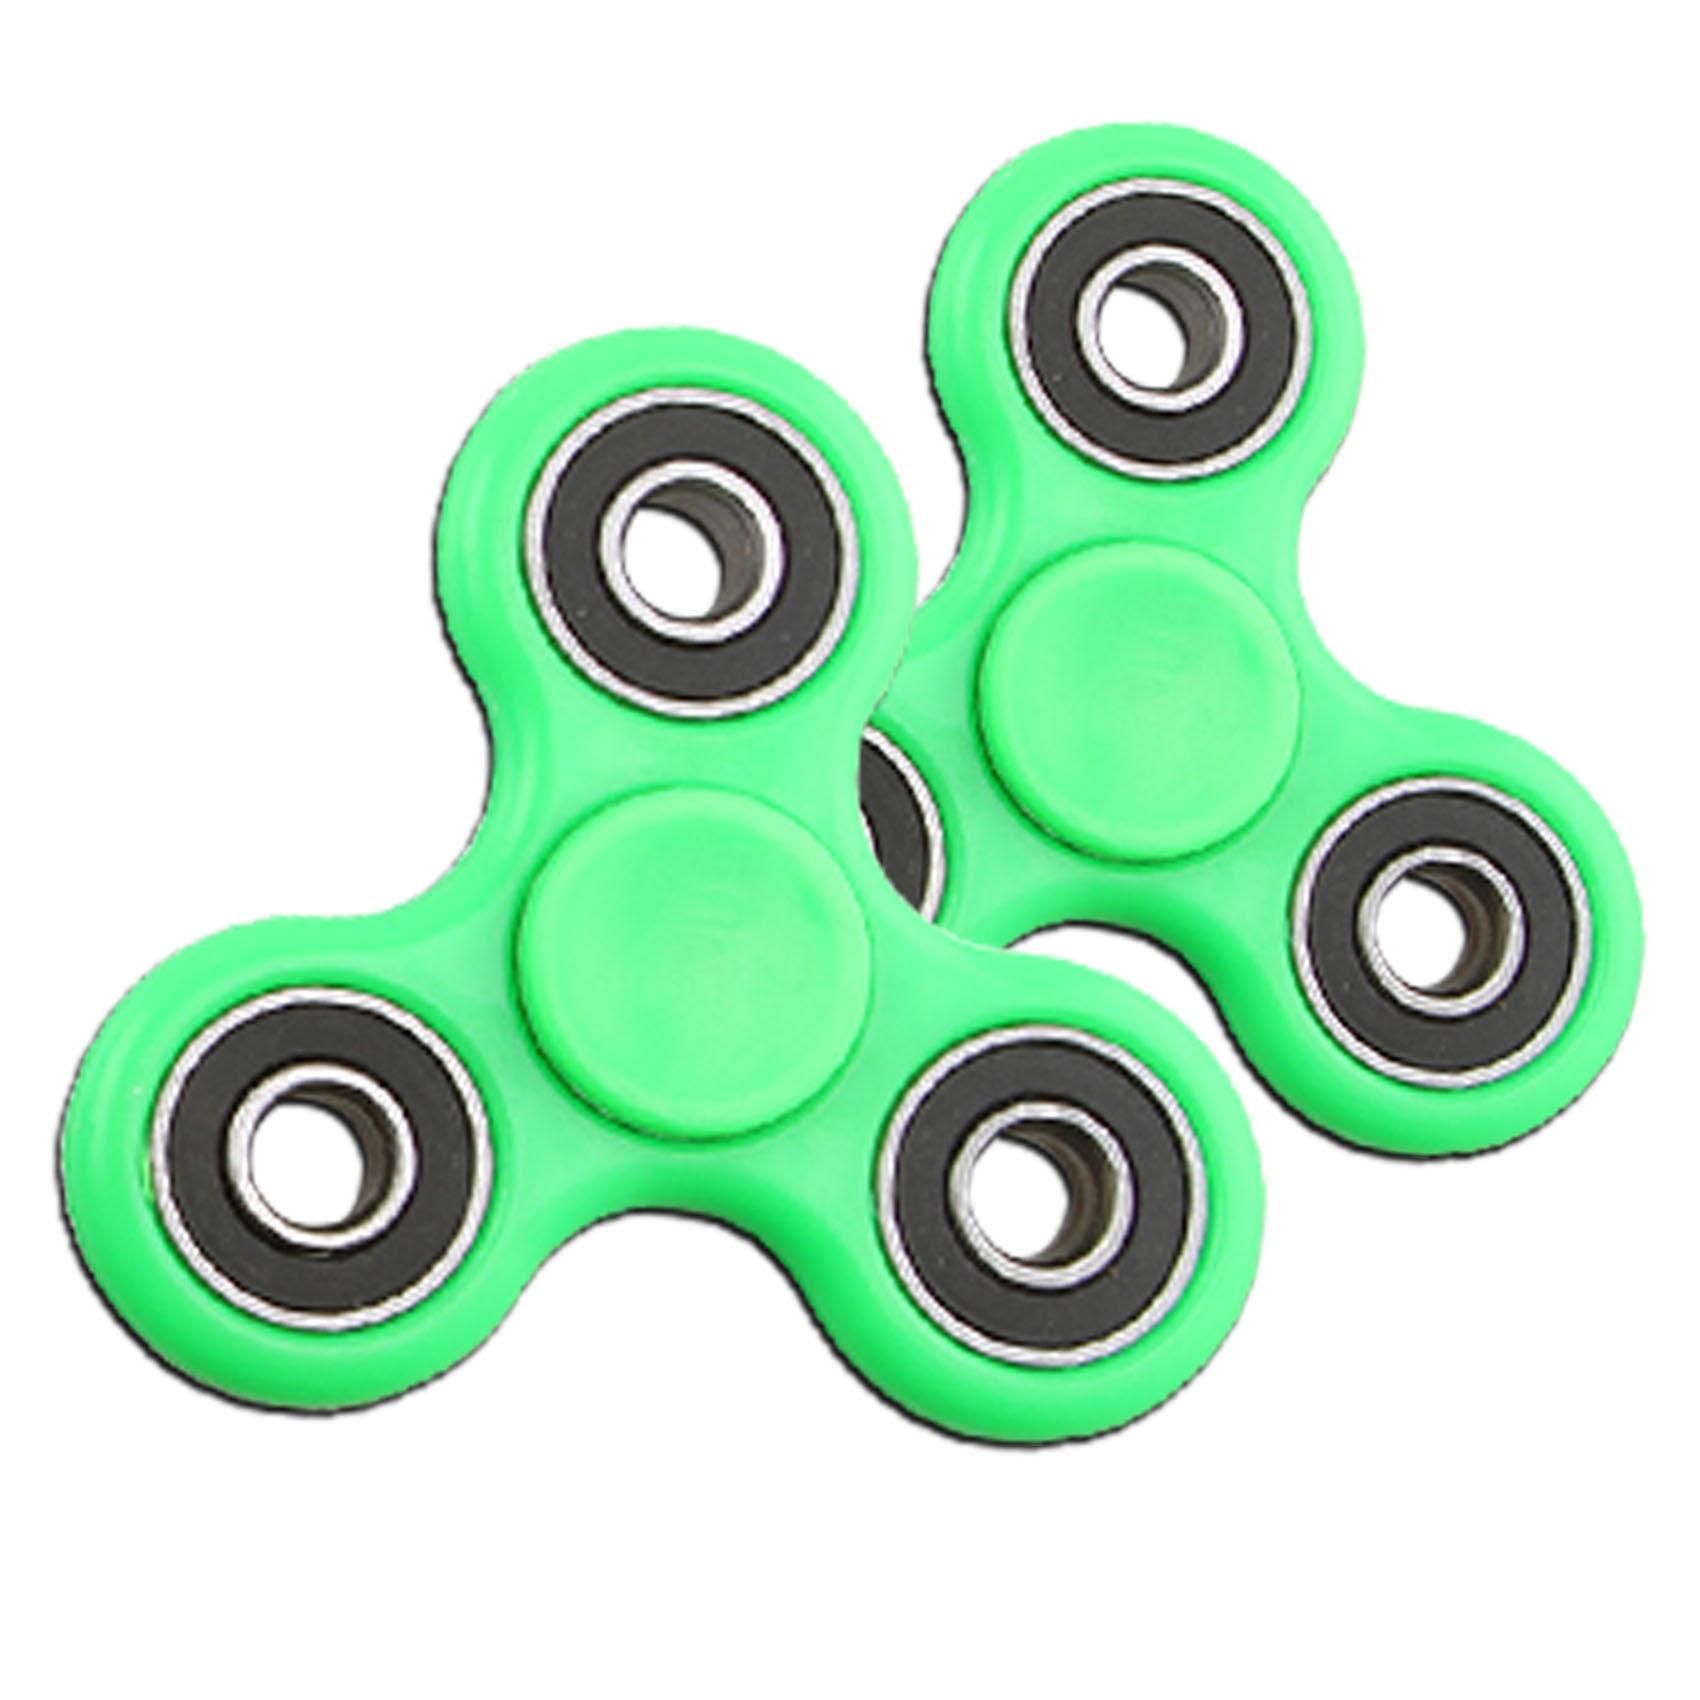 3D Finger Spinner Fid Hand Tri Focus Stress Toys Kids Adults